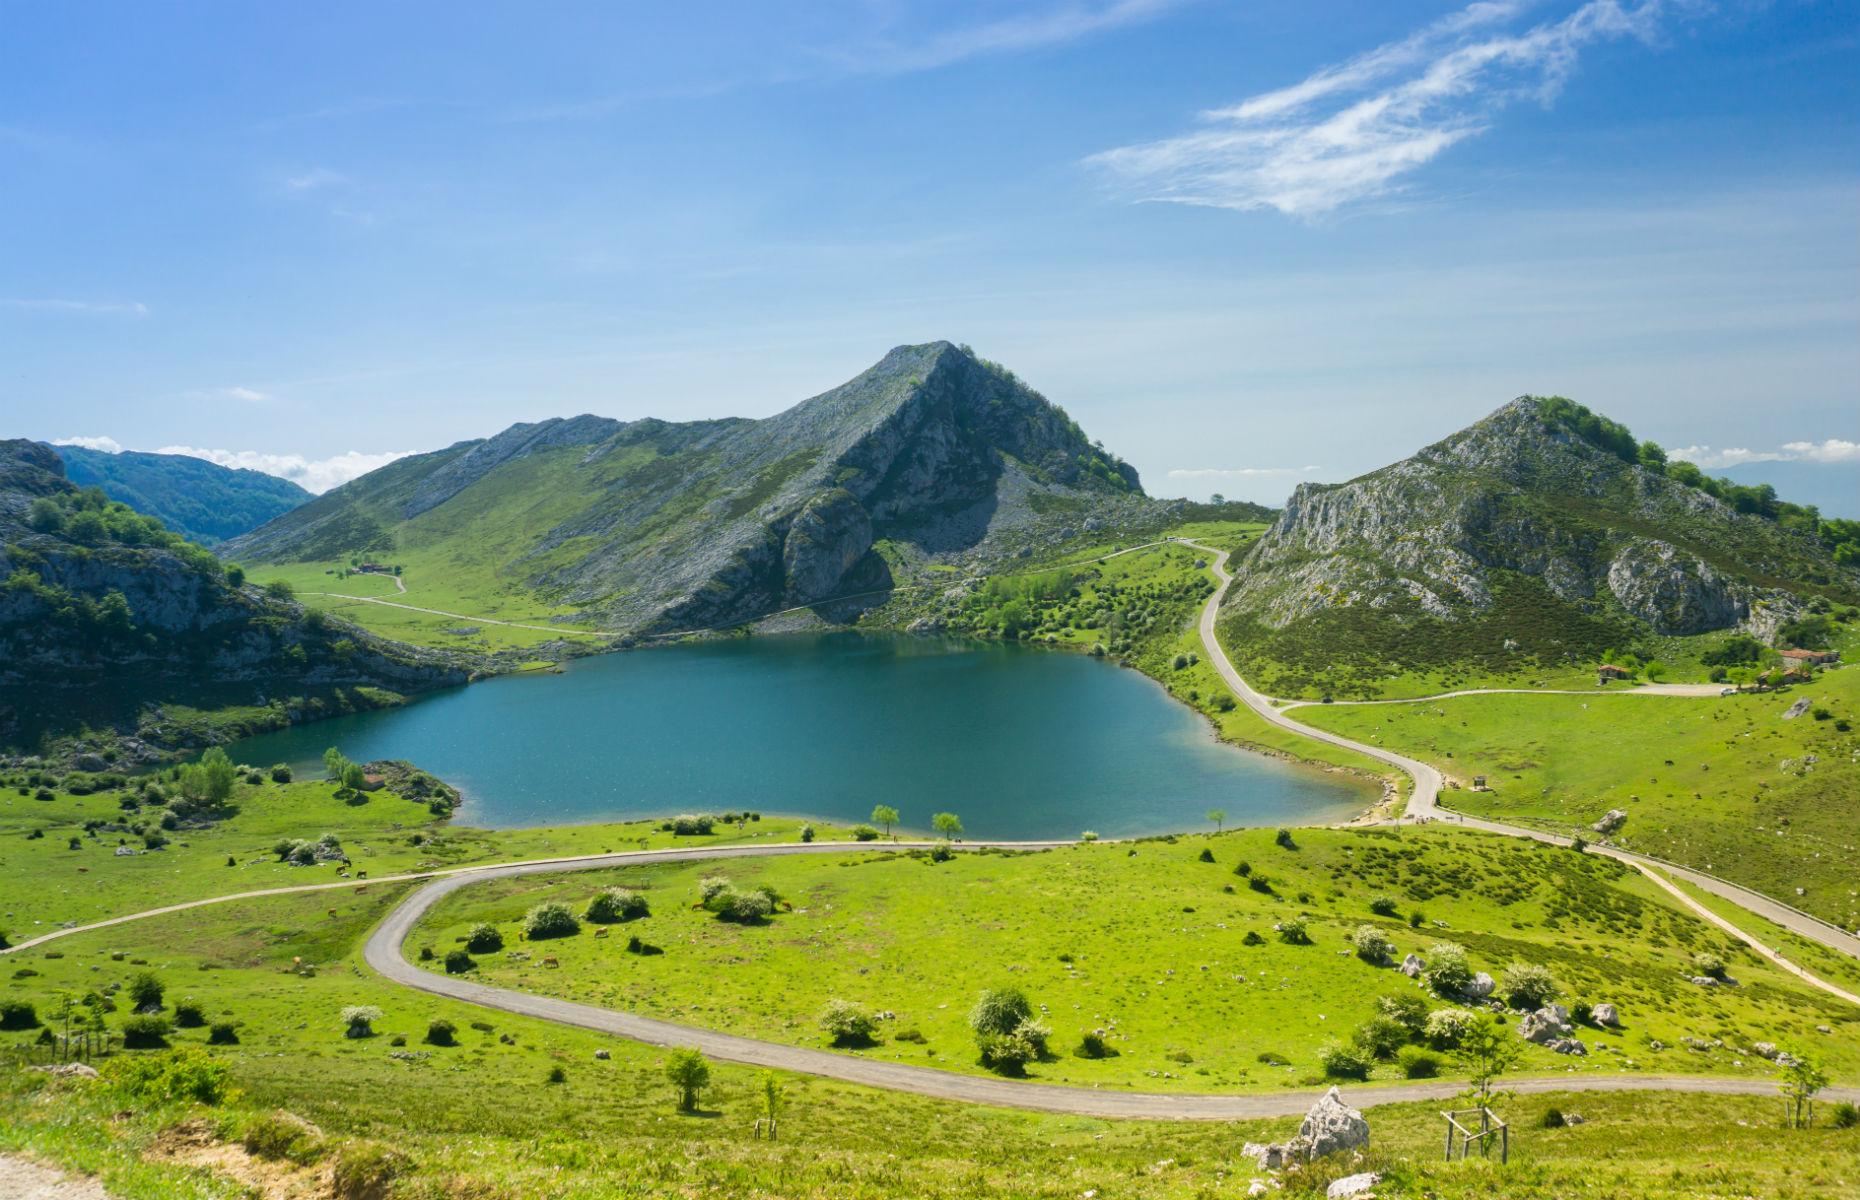 Lagos_de_Covadonga